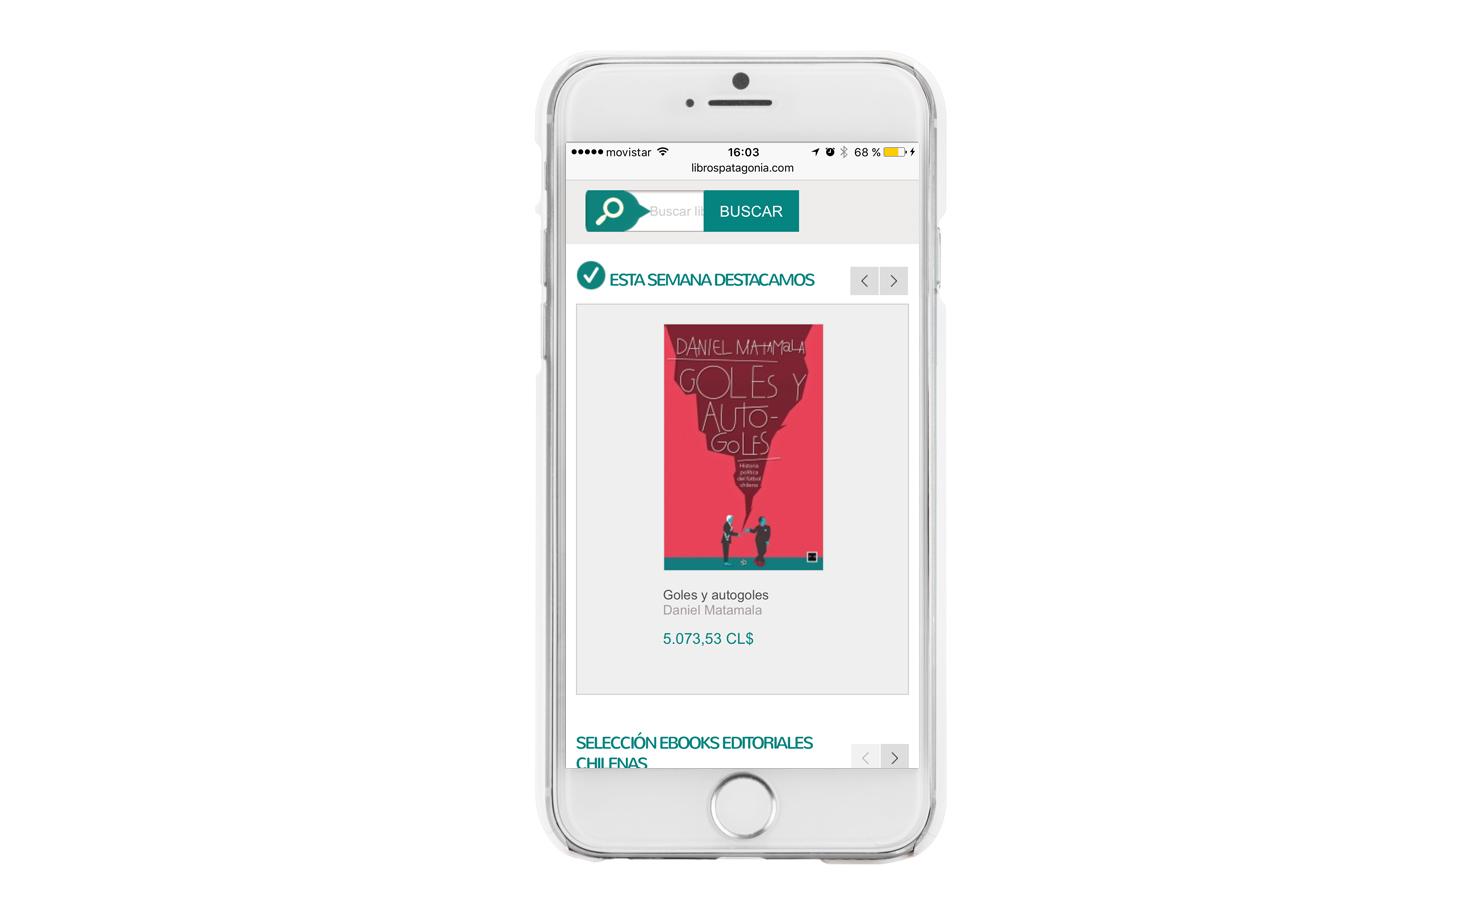 Proyecto Librospatagonia